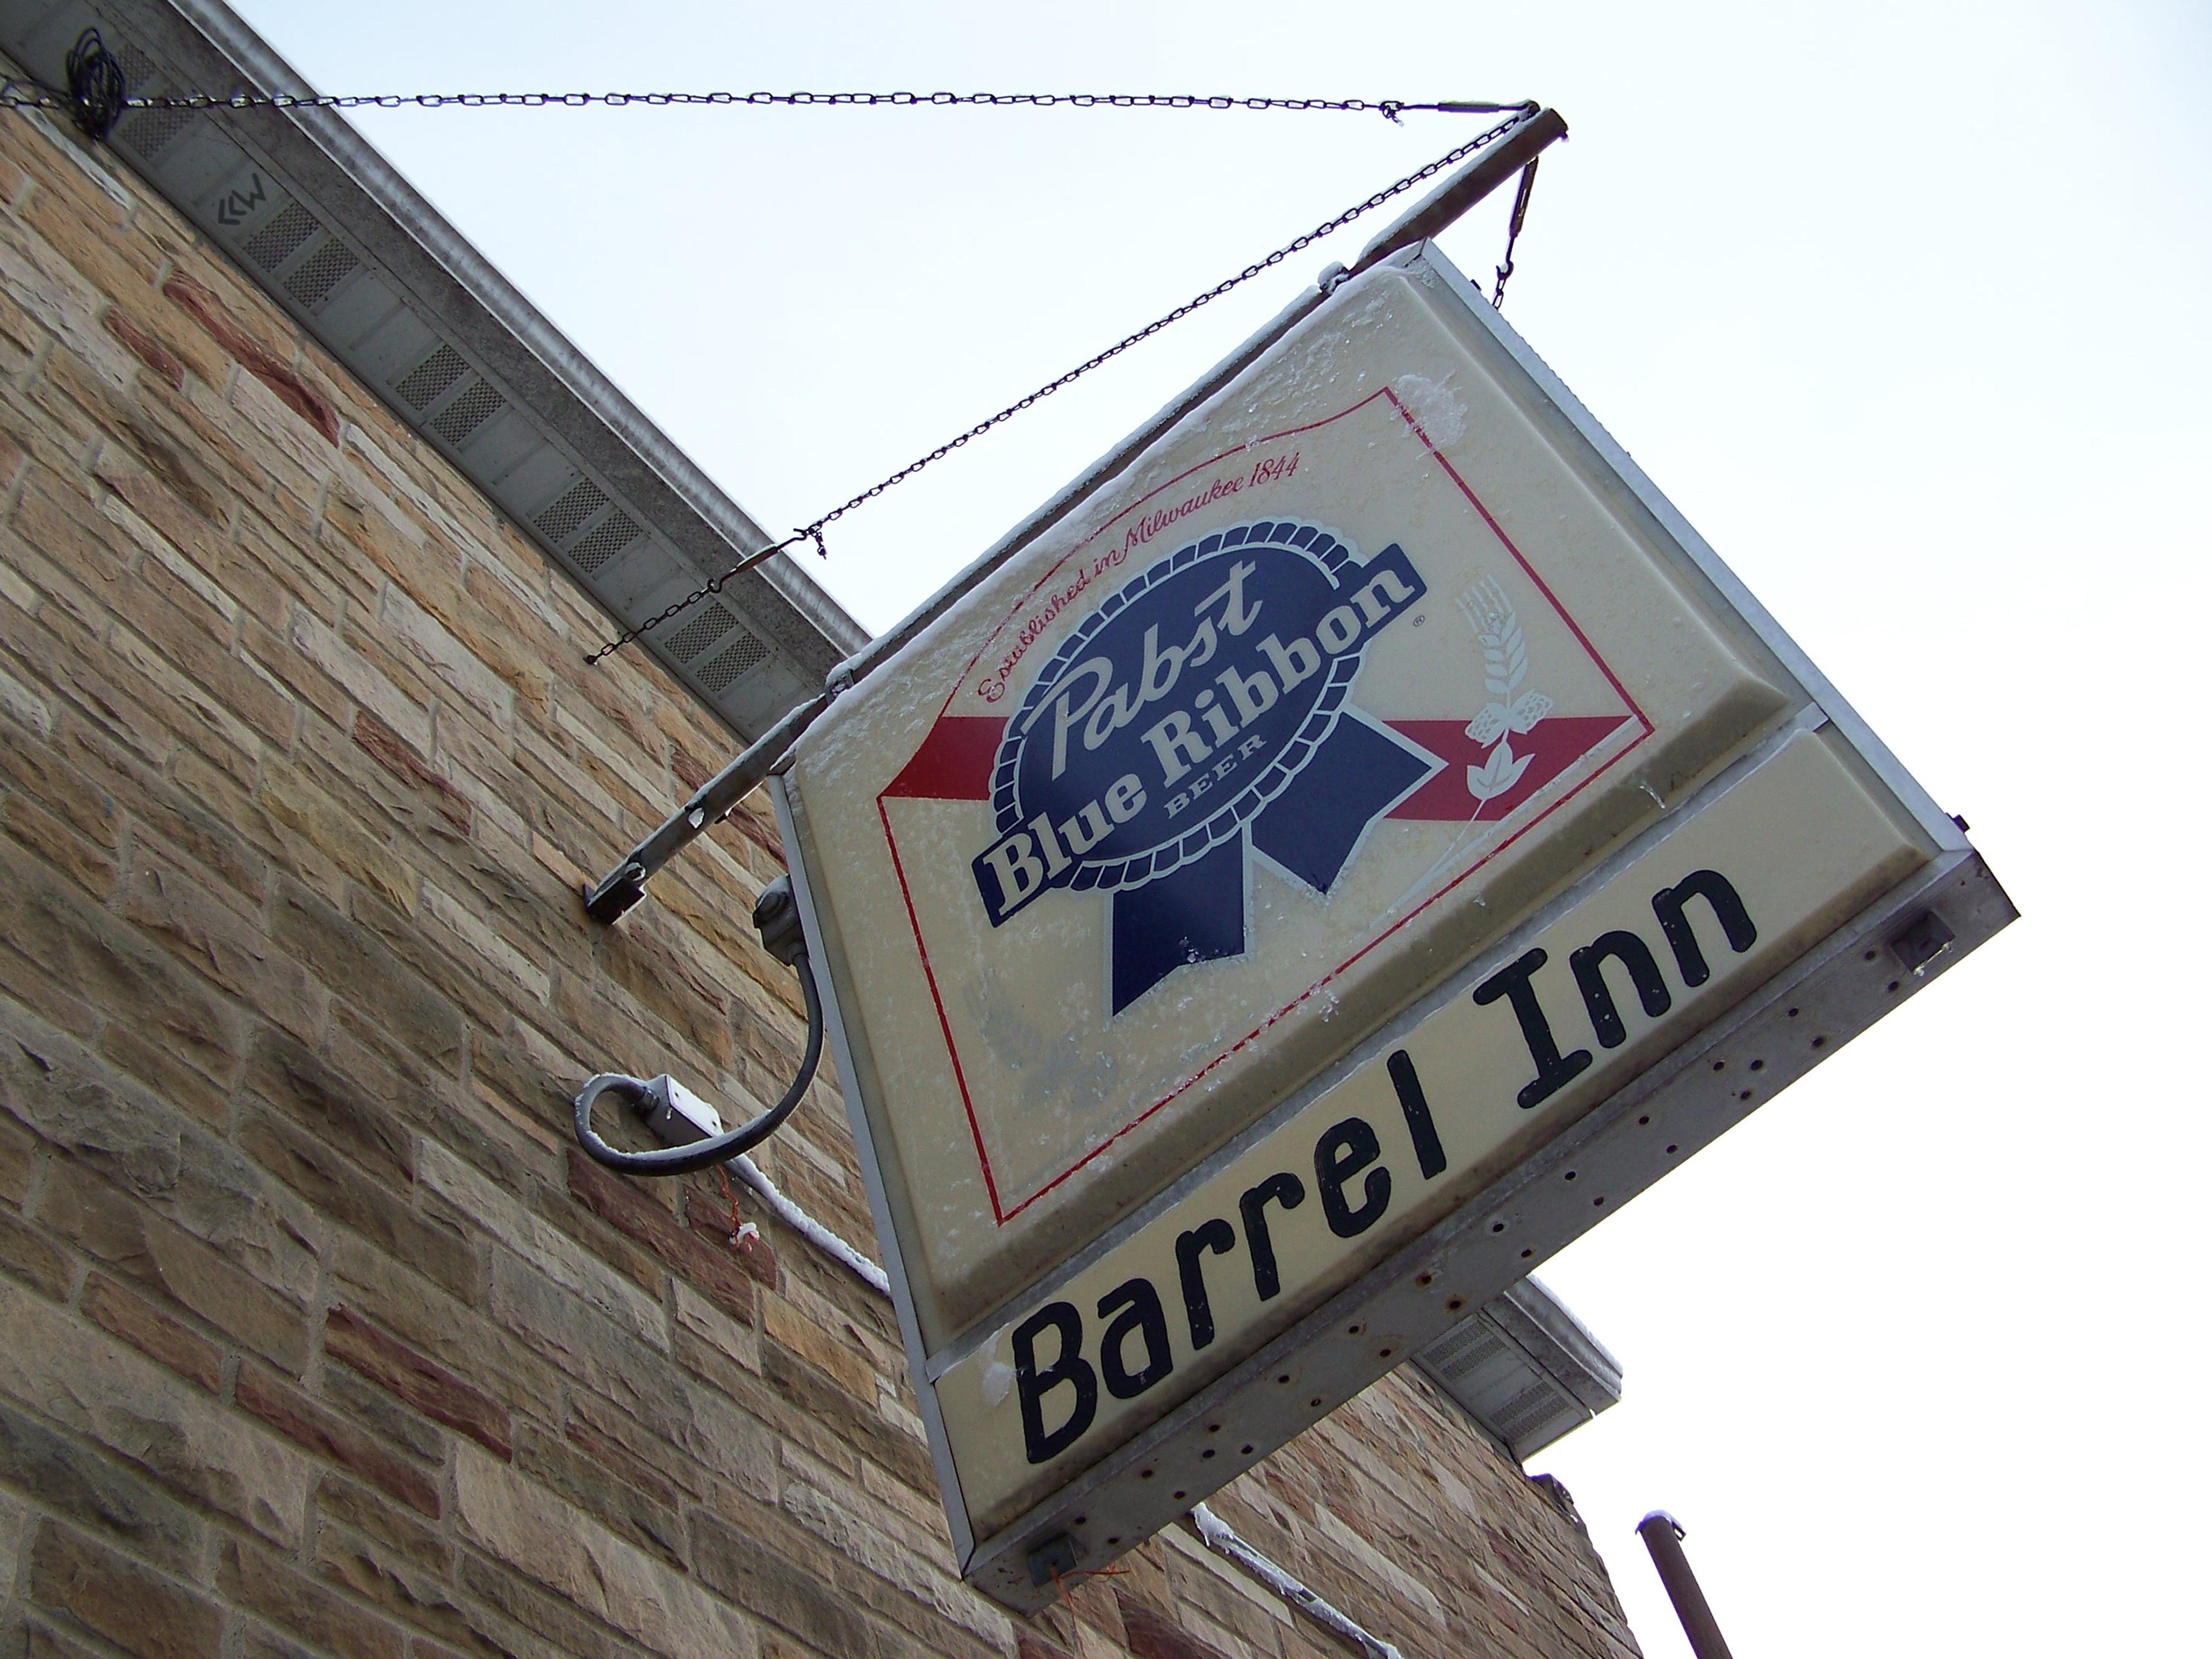 Kims Barrel Inn PBR sign St. Pt., WI 4/14/2014 624 by Crigger